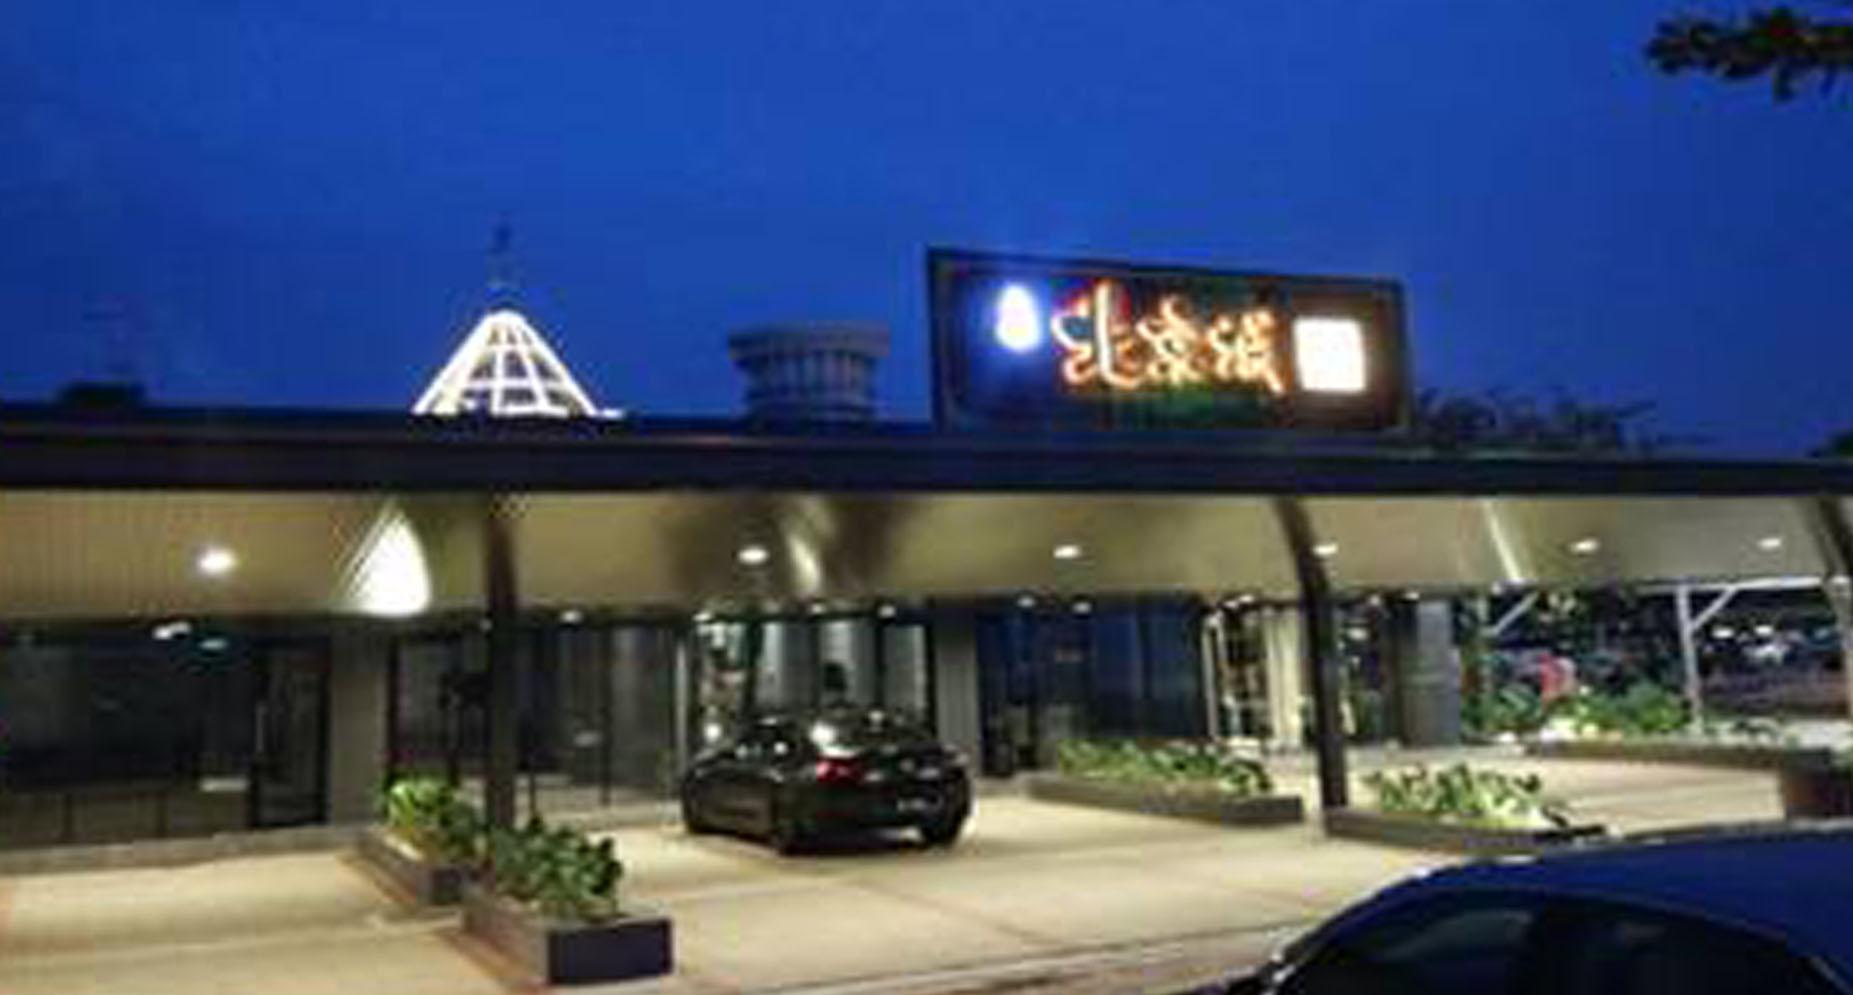 Pekin Restaurant Link at Sutera mall Johor Bahru